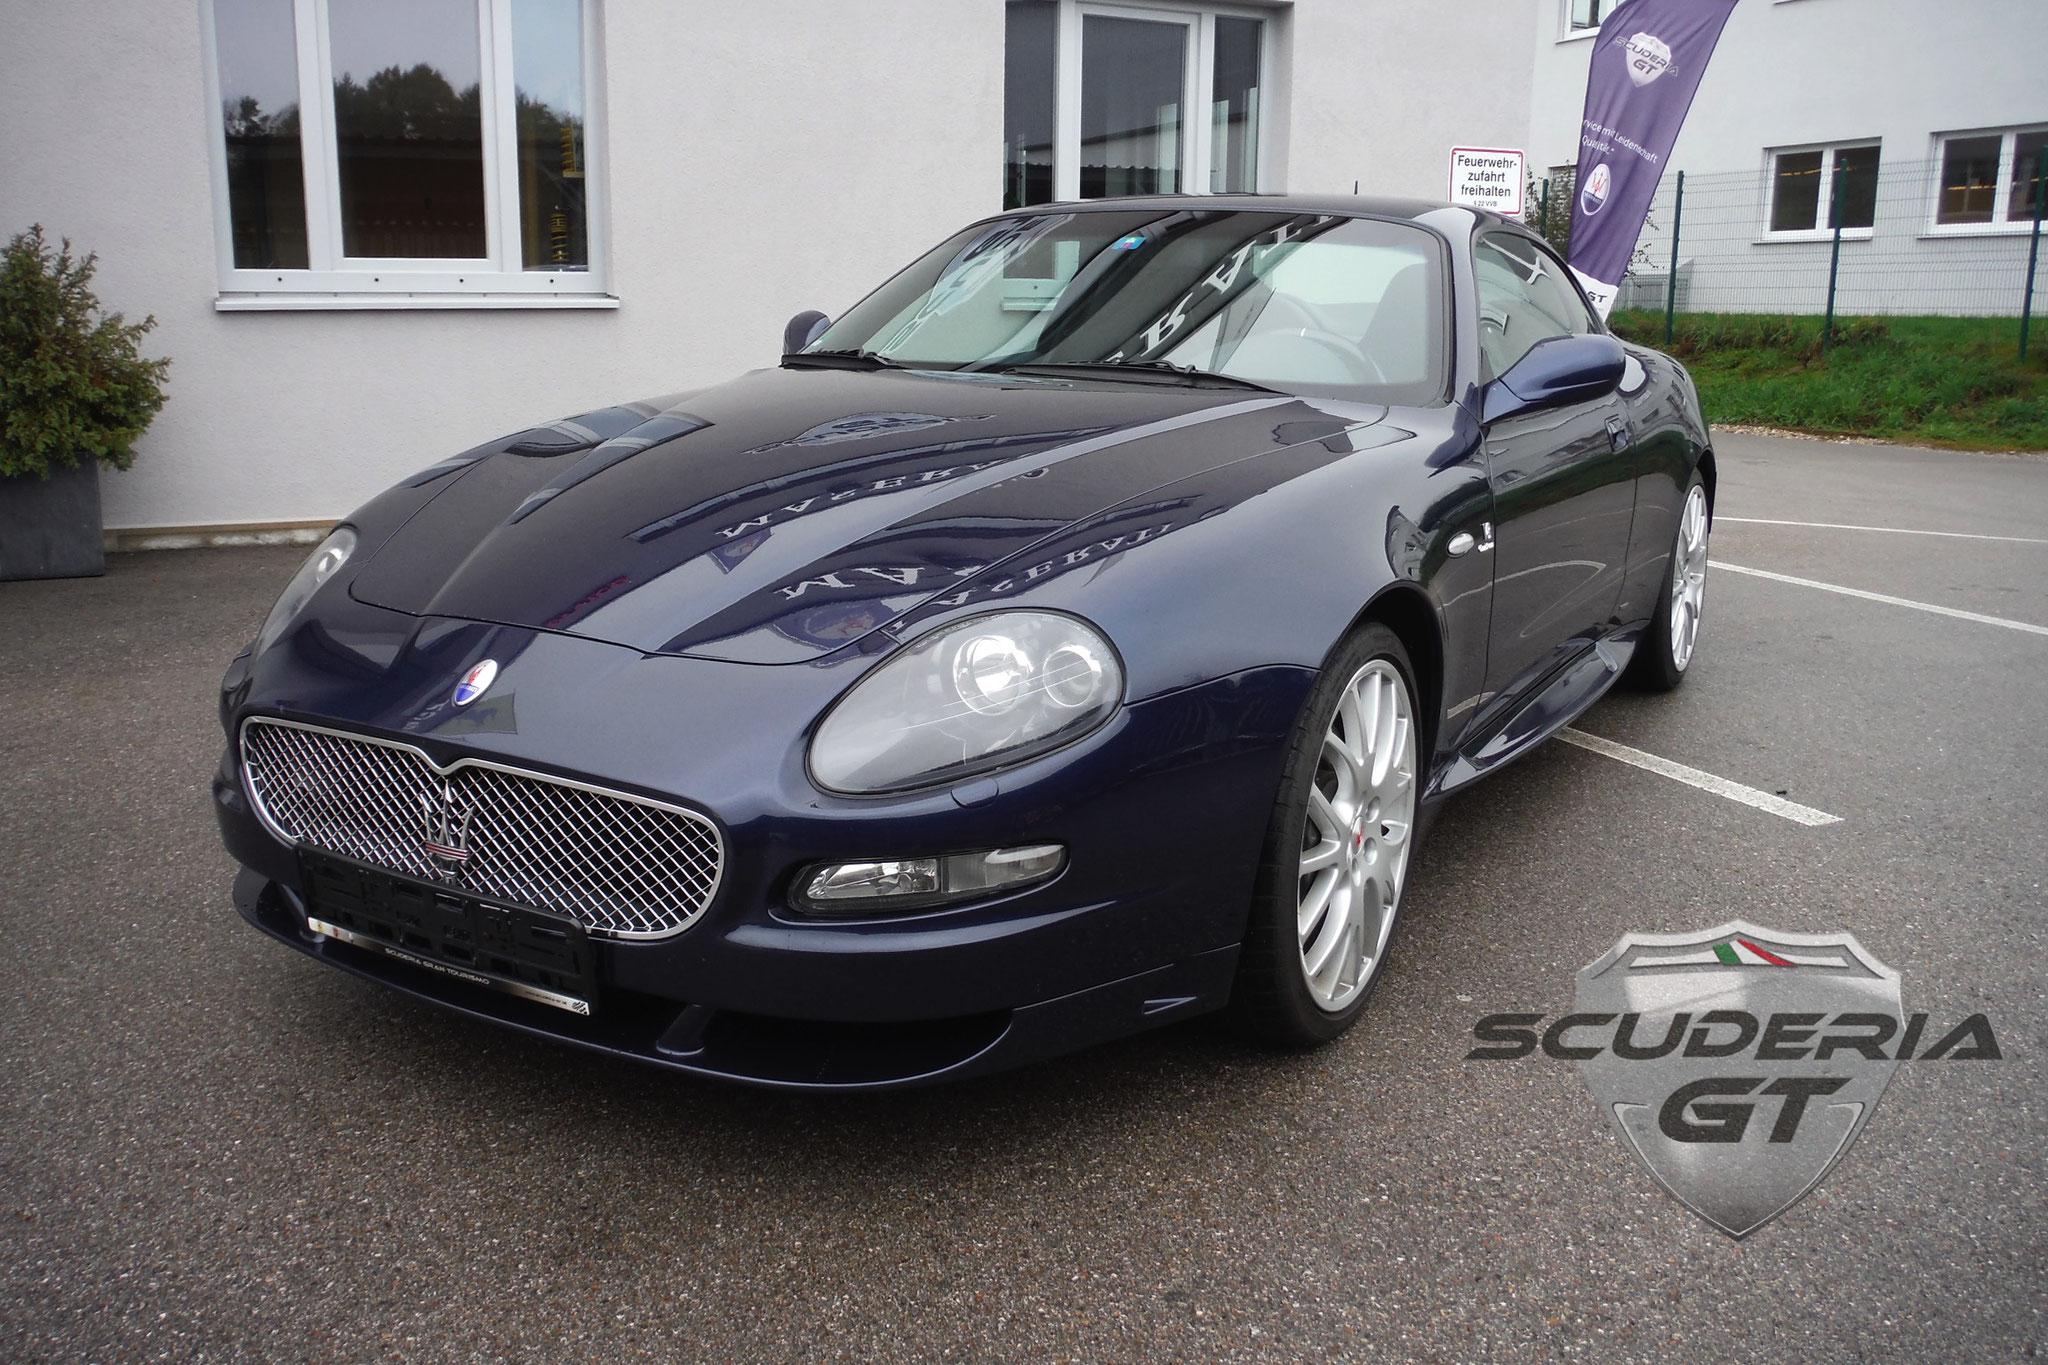 Maserati GranSport (SOLD)